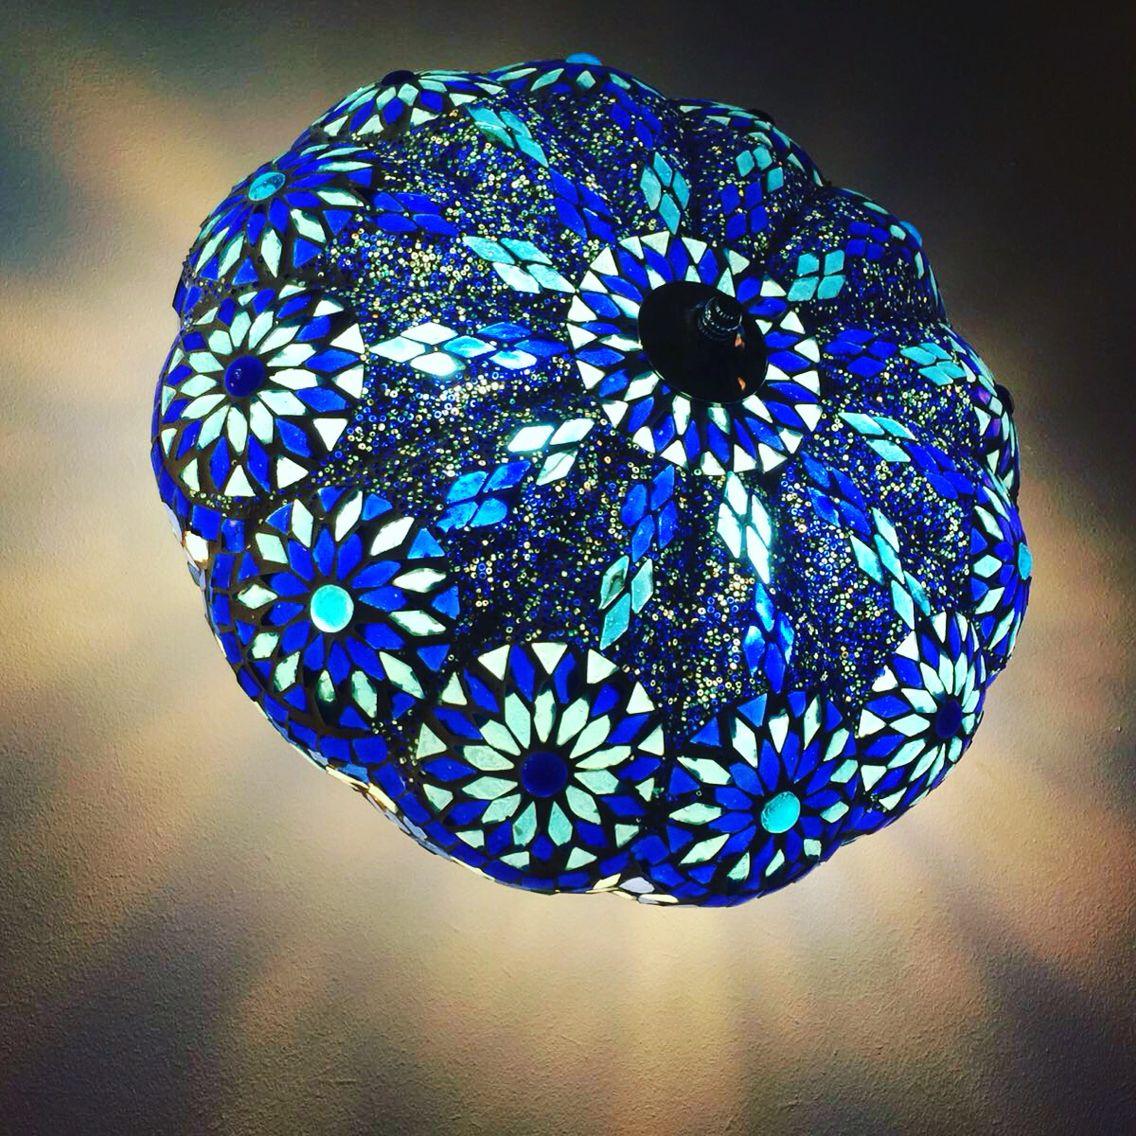 Blue and aqua Mosaic ceiling lamp. Ibiza style.